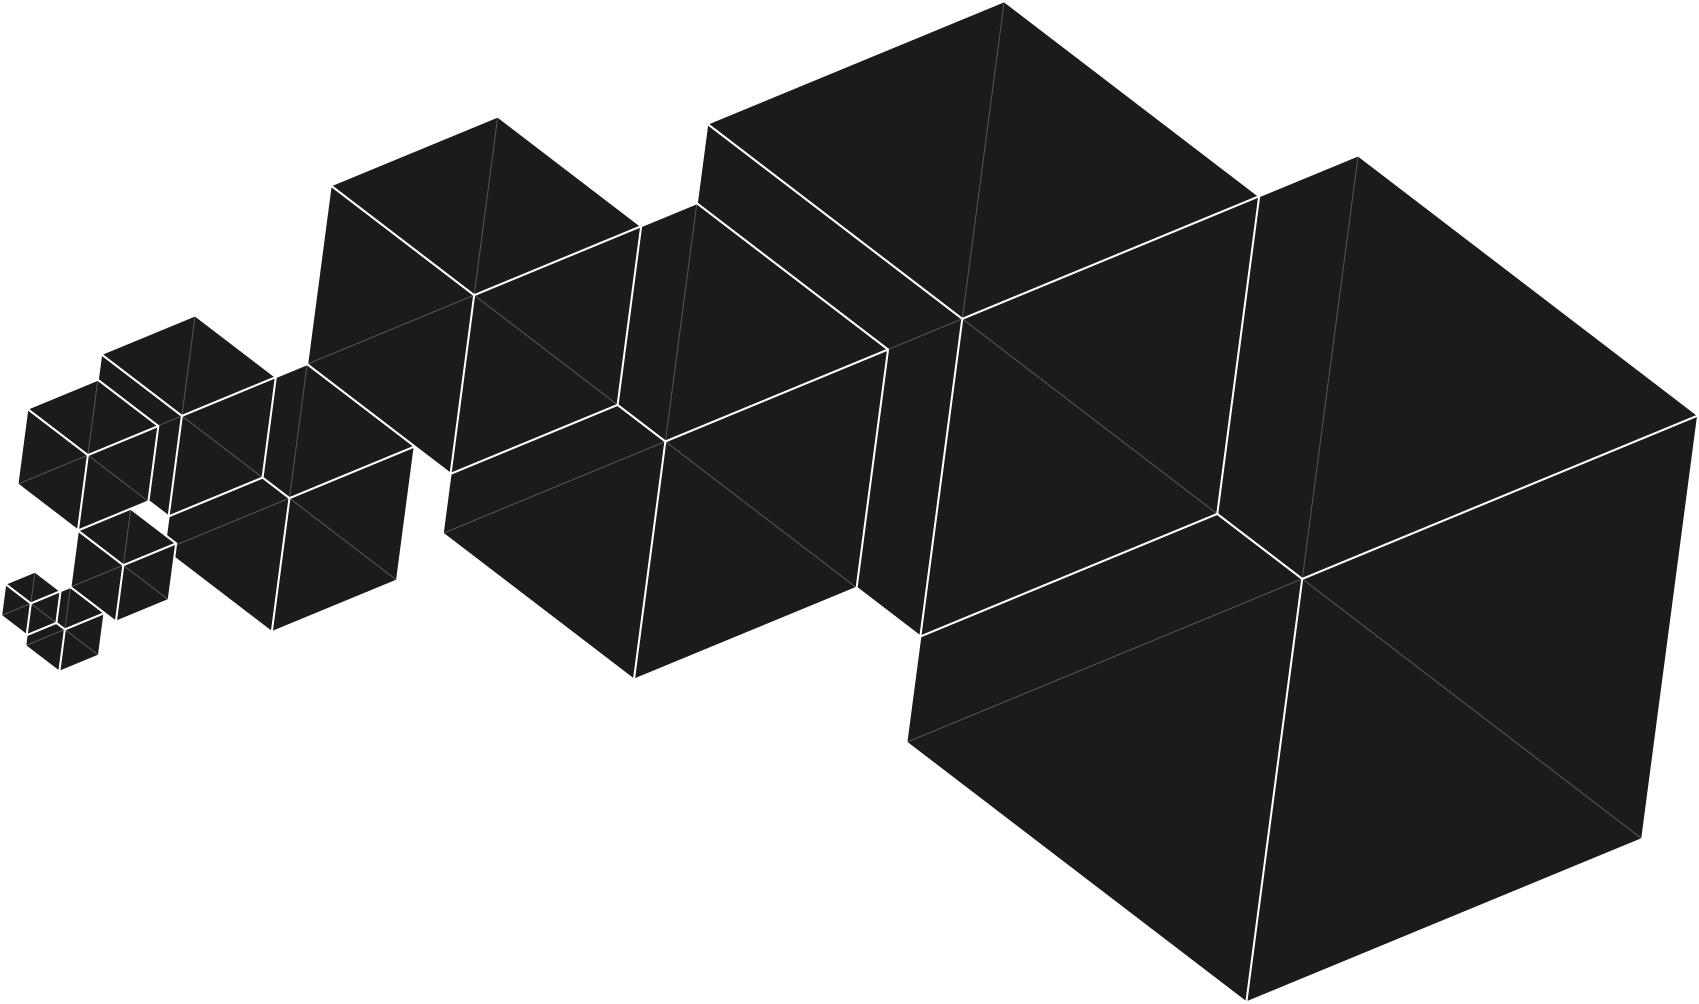 HEXAGONS_10.jpg